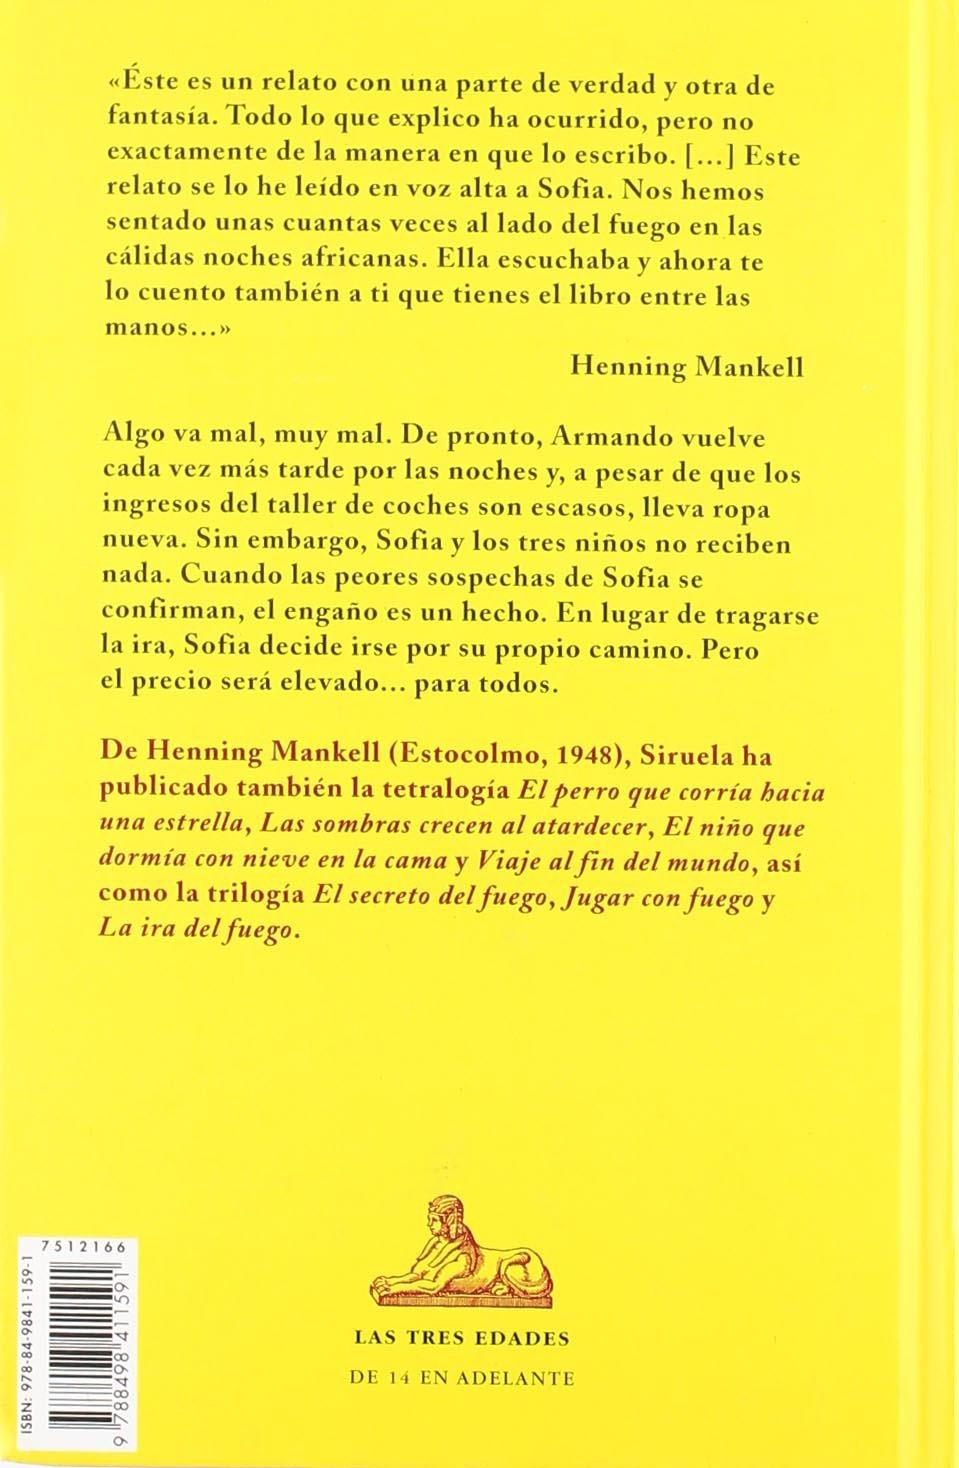 La ira del fuego / the Wrath of Fire (Spanish Edition): Henning Mankell: 9788498411591: Amazon.com: Books